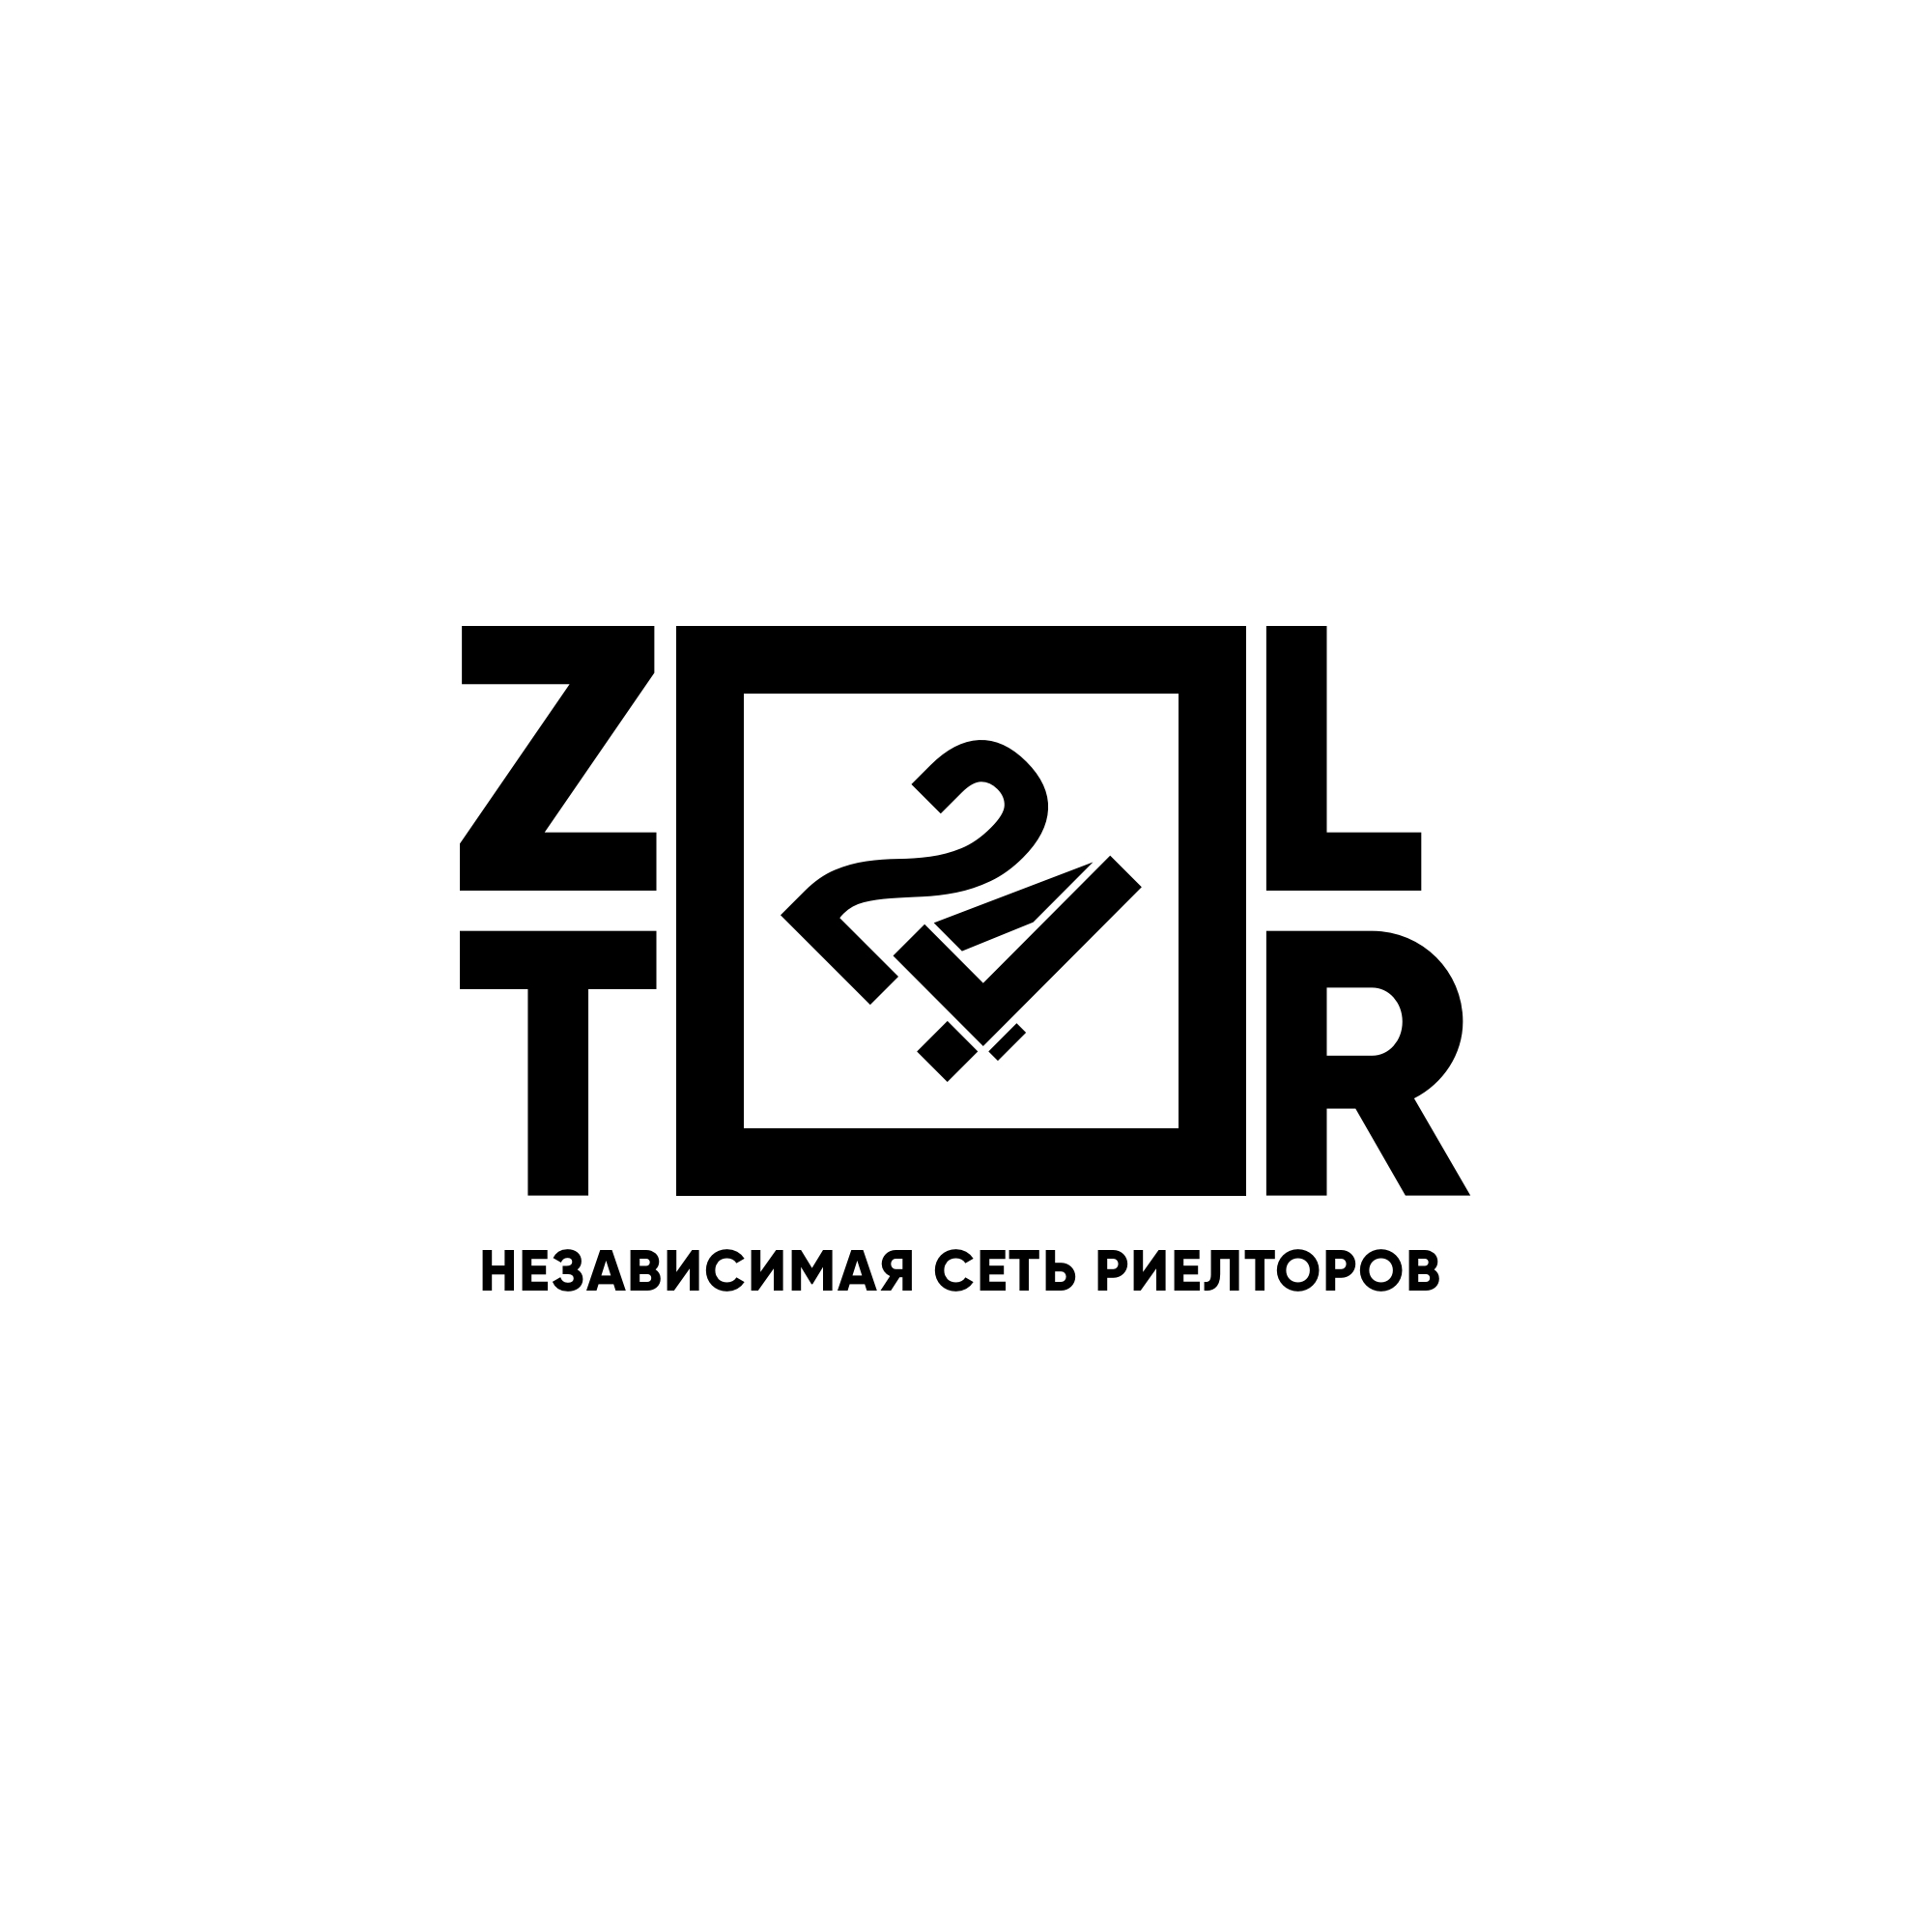 Логотип и фирменный стиль ZolTor24 фото f_2245c8bf590a9c58.jpg